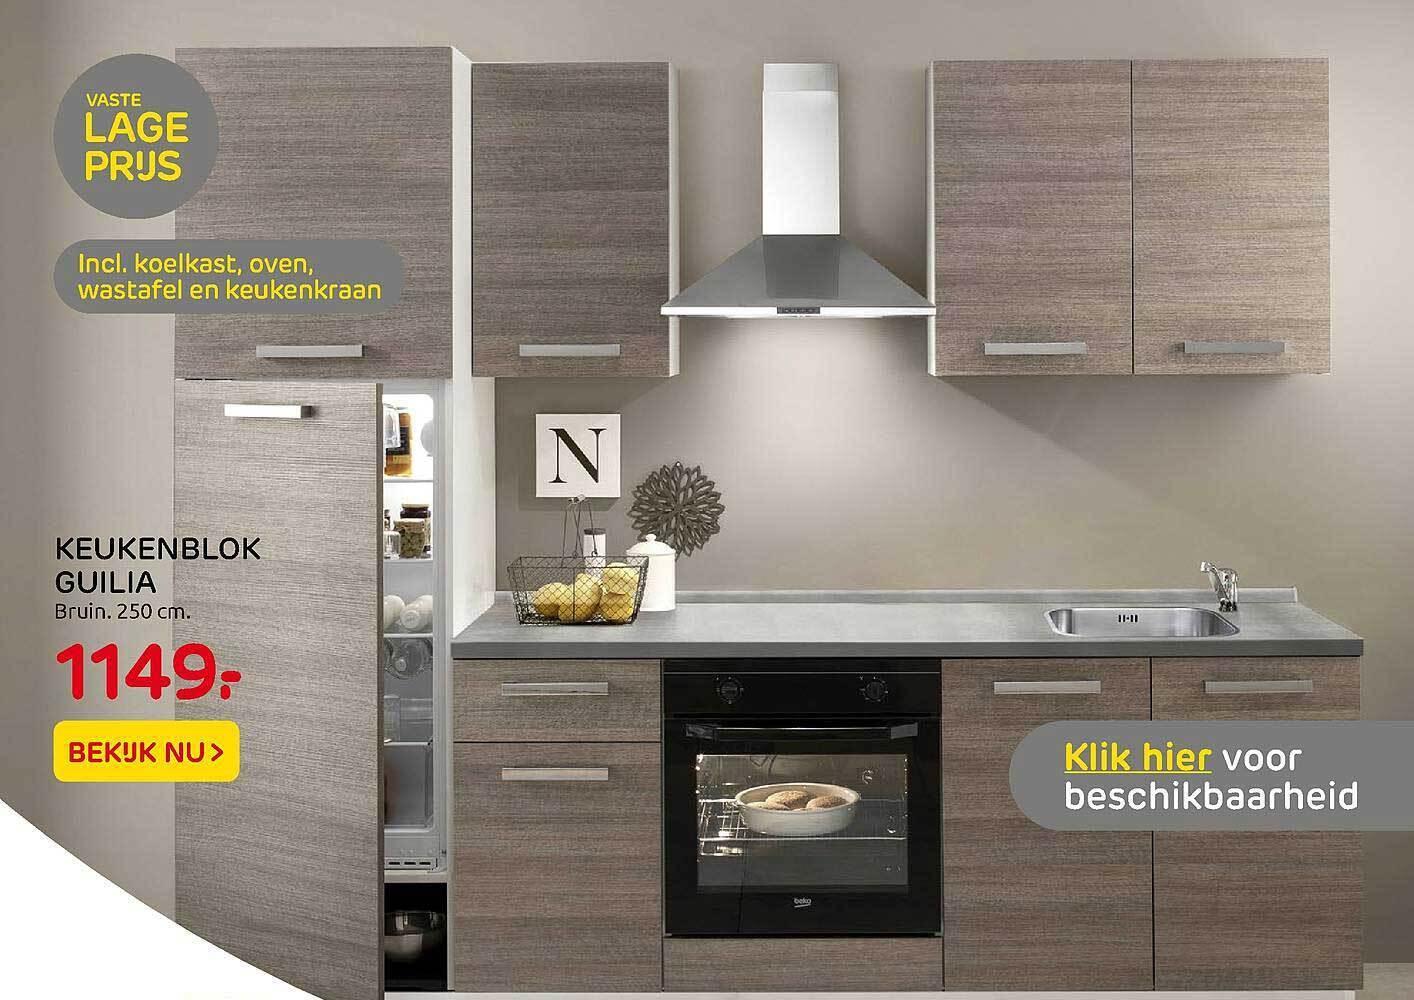 Keukenblok Guilia 250 Cm Aanbieding Bij Praxis